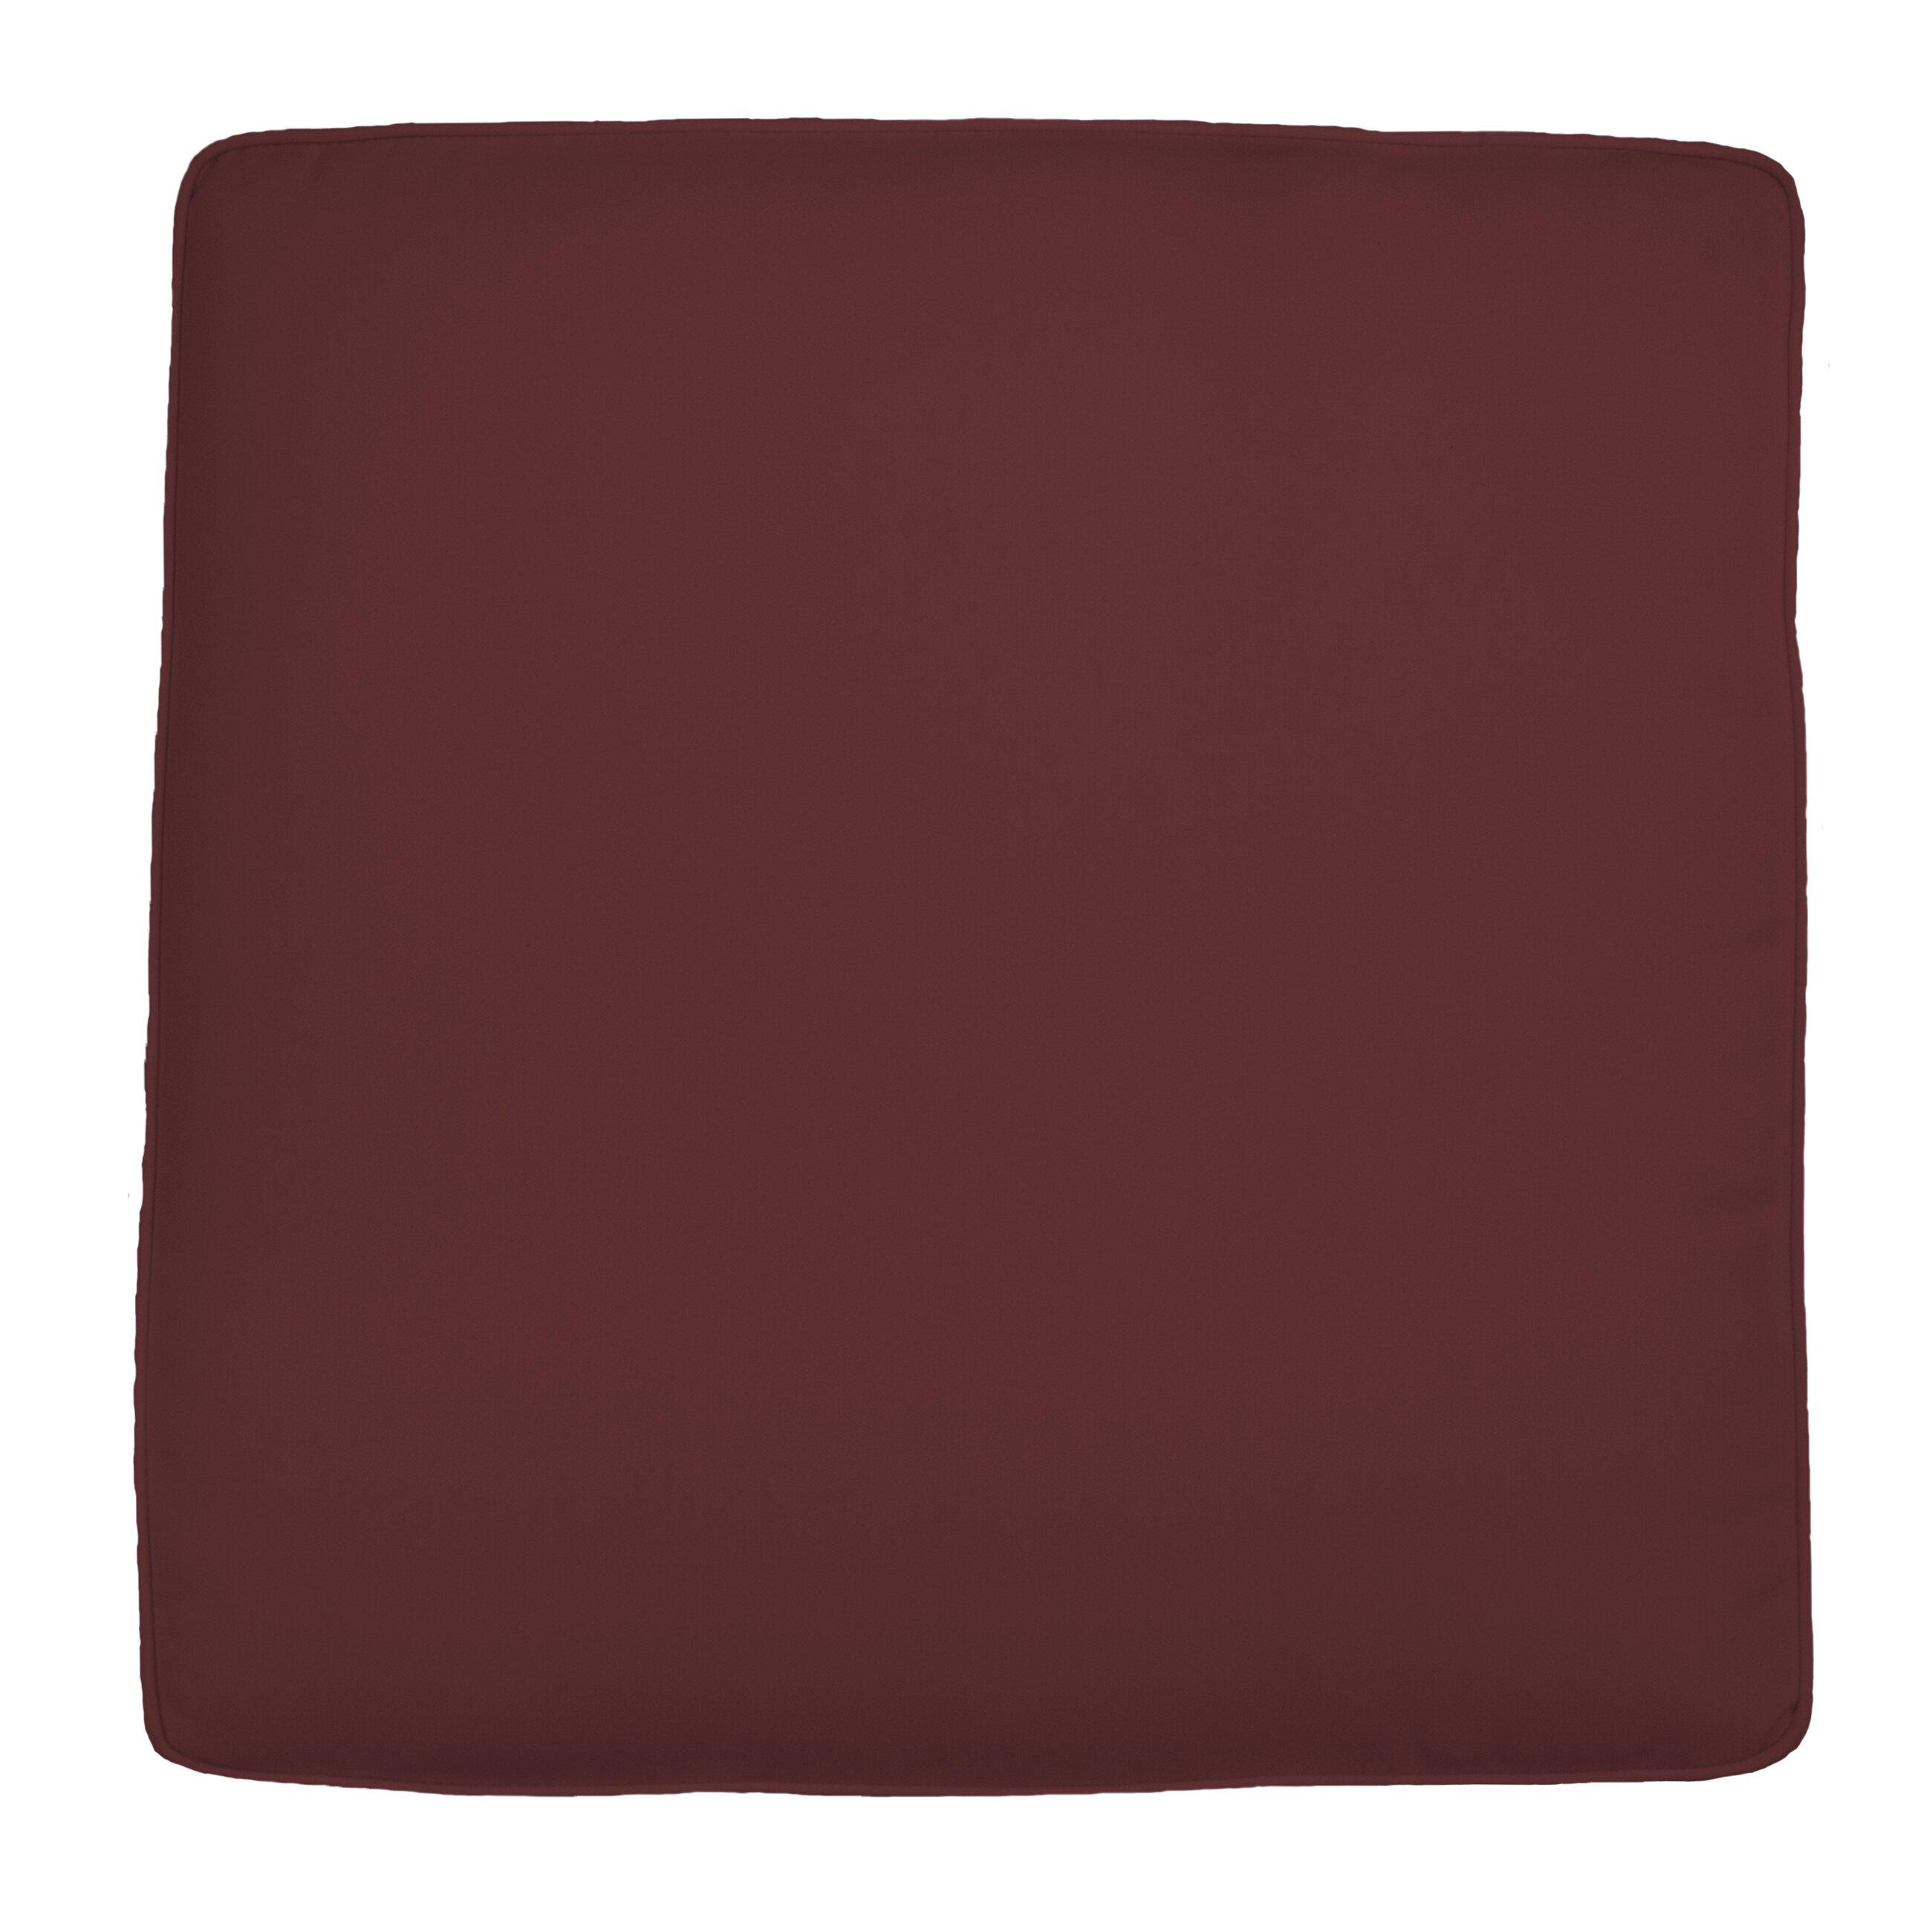 Wayfair Custom Outdoor Cushions Knife Edge Outdoor Ottoman